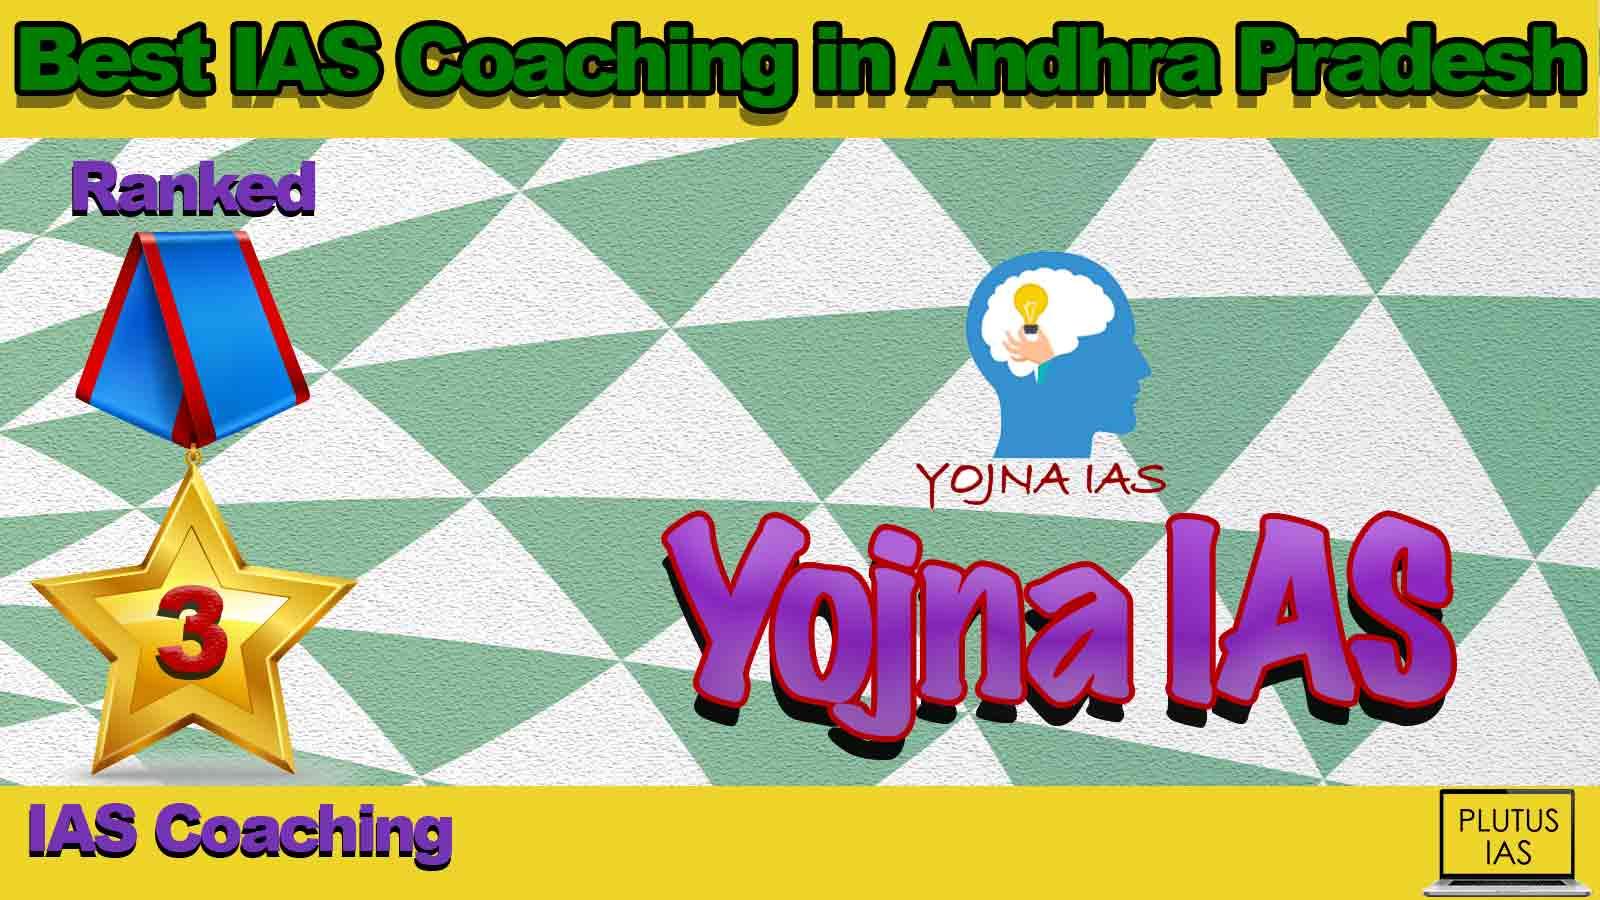 Best IAS Coaching in Andhra Pradesh